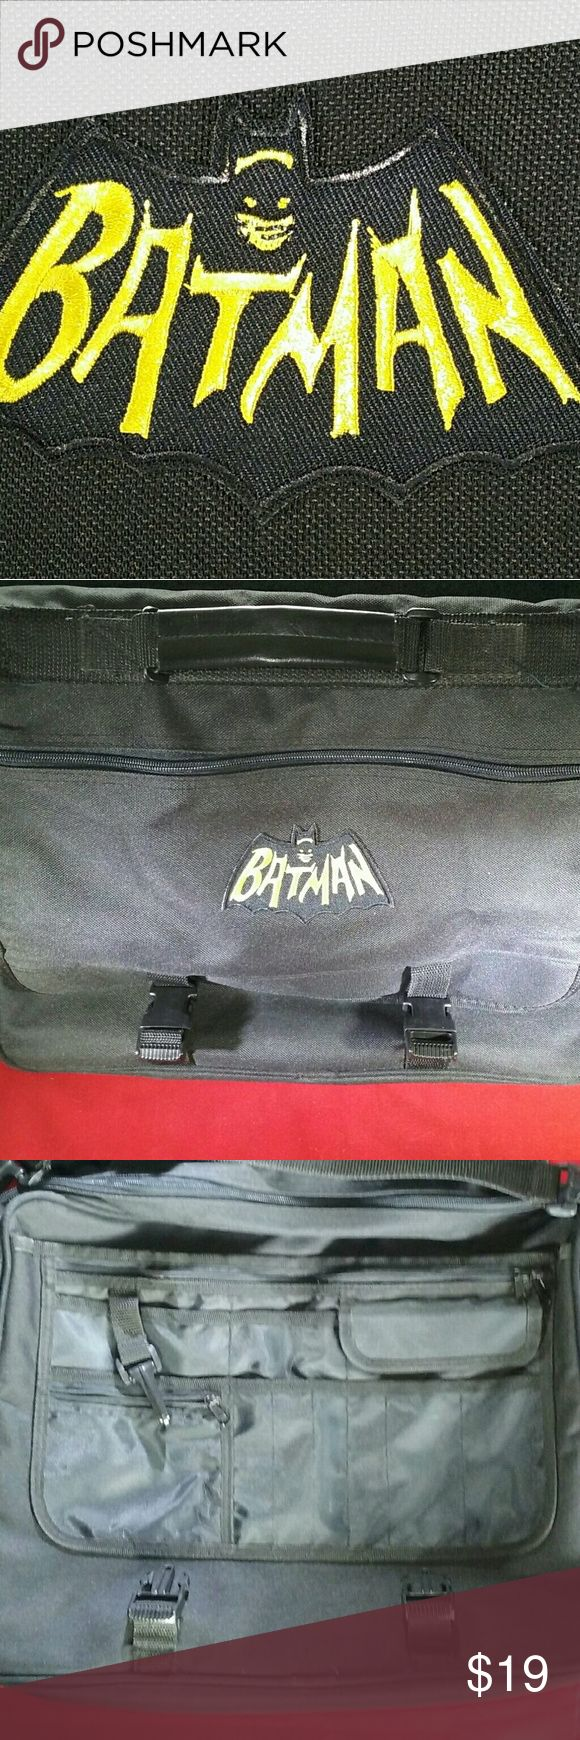 "Batman Canvas Messenger Bag Black canvas messenger bag with retro Batman patch * Adjustable shoulder strap * Zippered pocket in flap * Multiple pockets/sleeves for pens, change, keys, sundries, etc. * Large interior space fits laptop, tablet, file folders, etc. * Measures 15.5"" x 11.5"" x 4"" * Side zipper allows it to expand to 15.5"" x 11.5"" x 6"" Bags Messenger Bags"